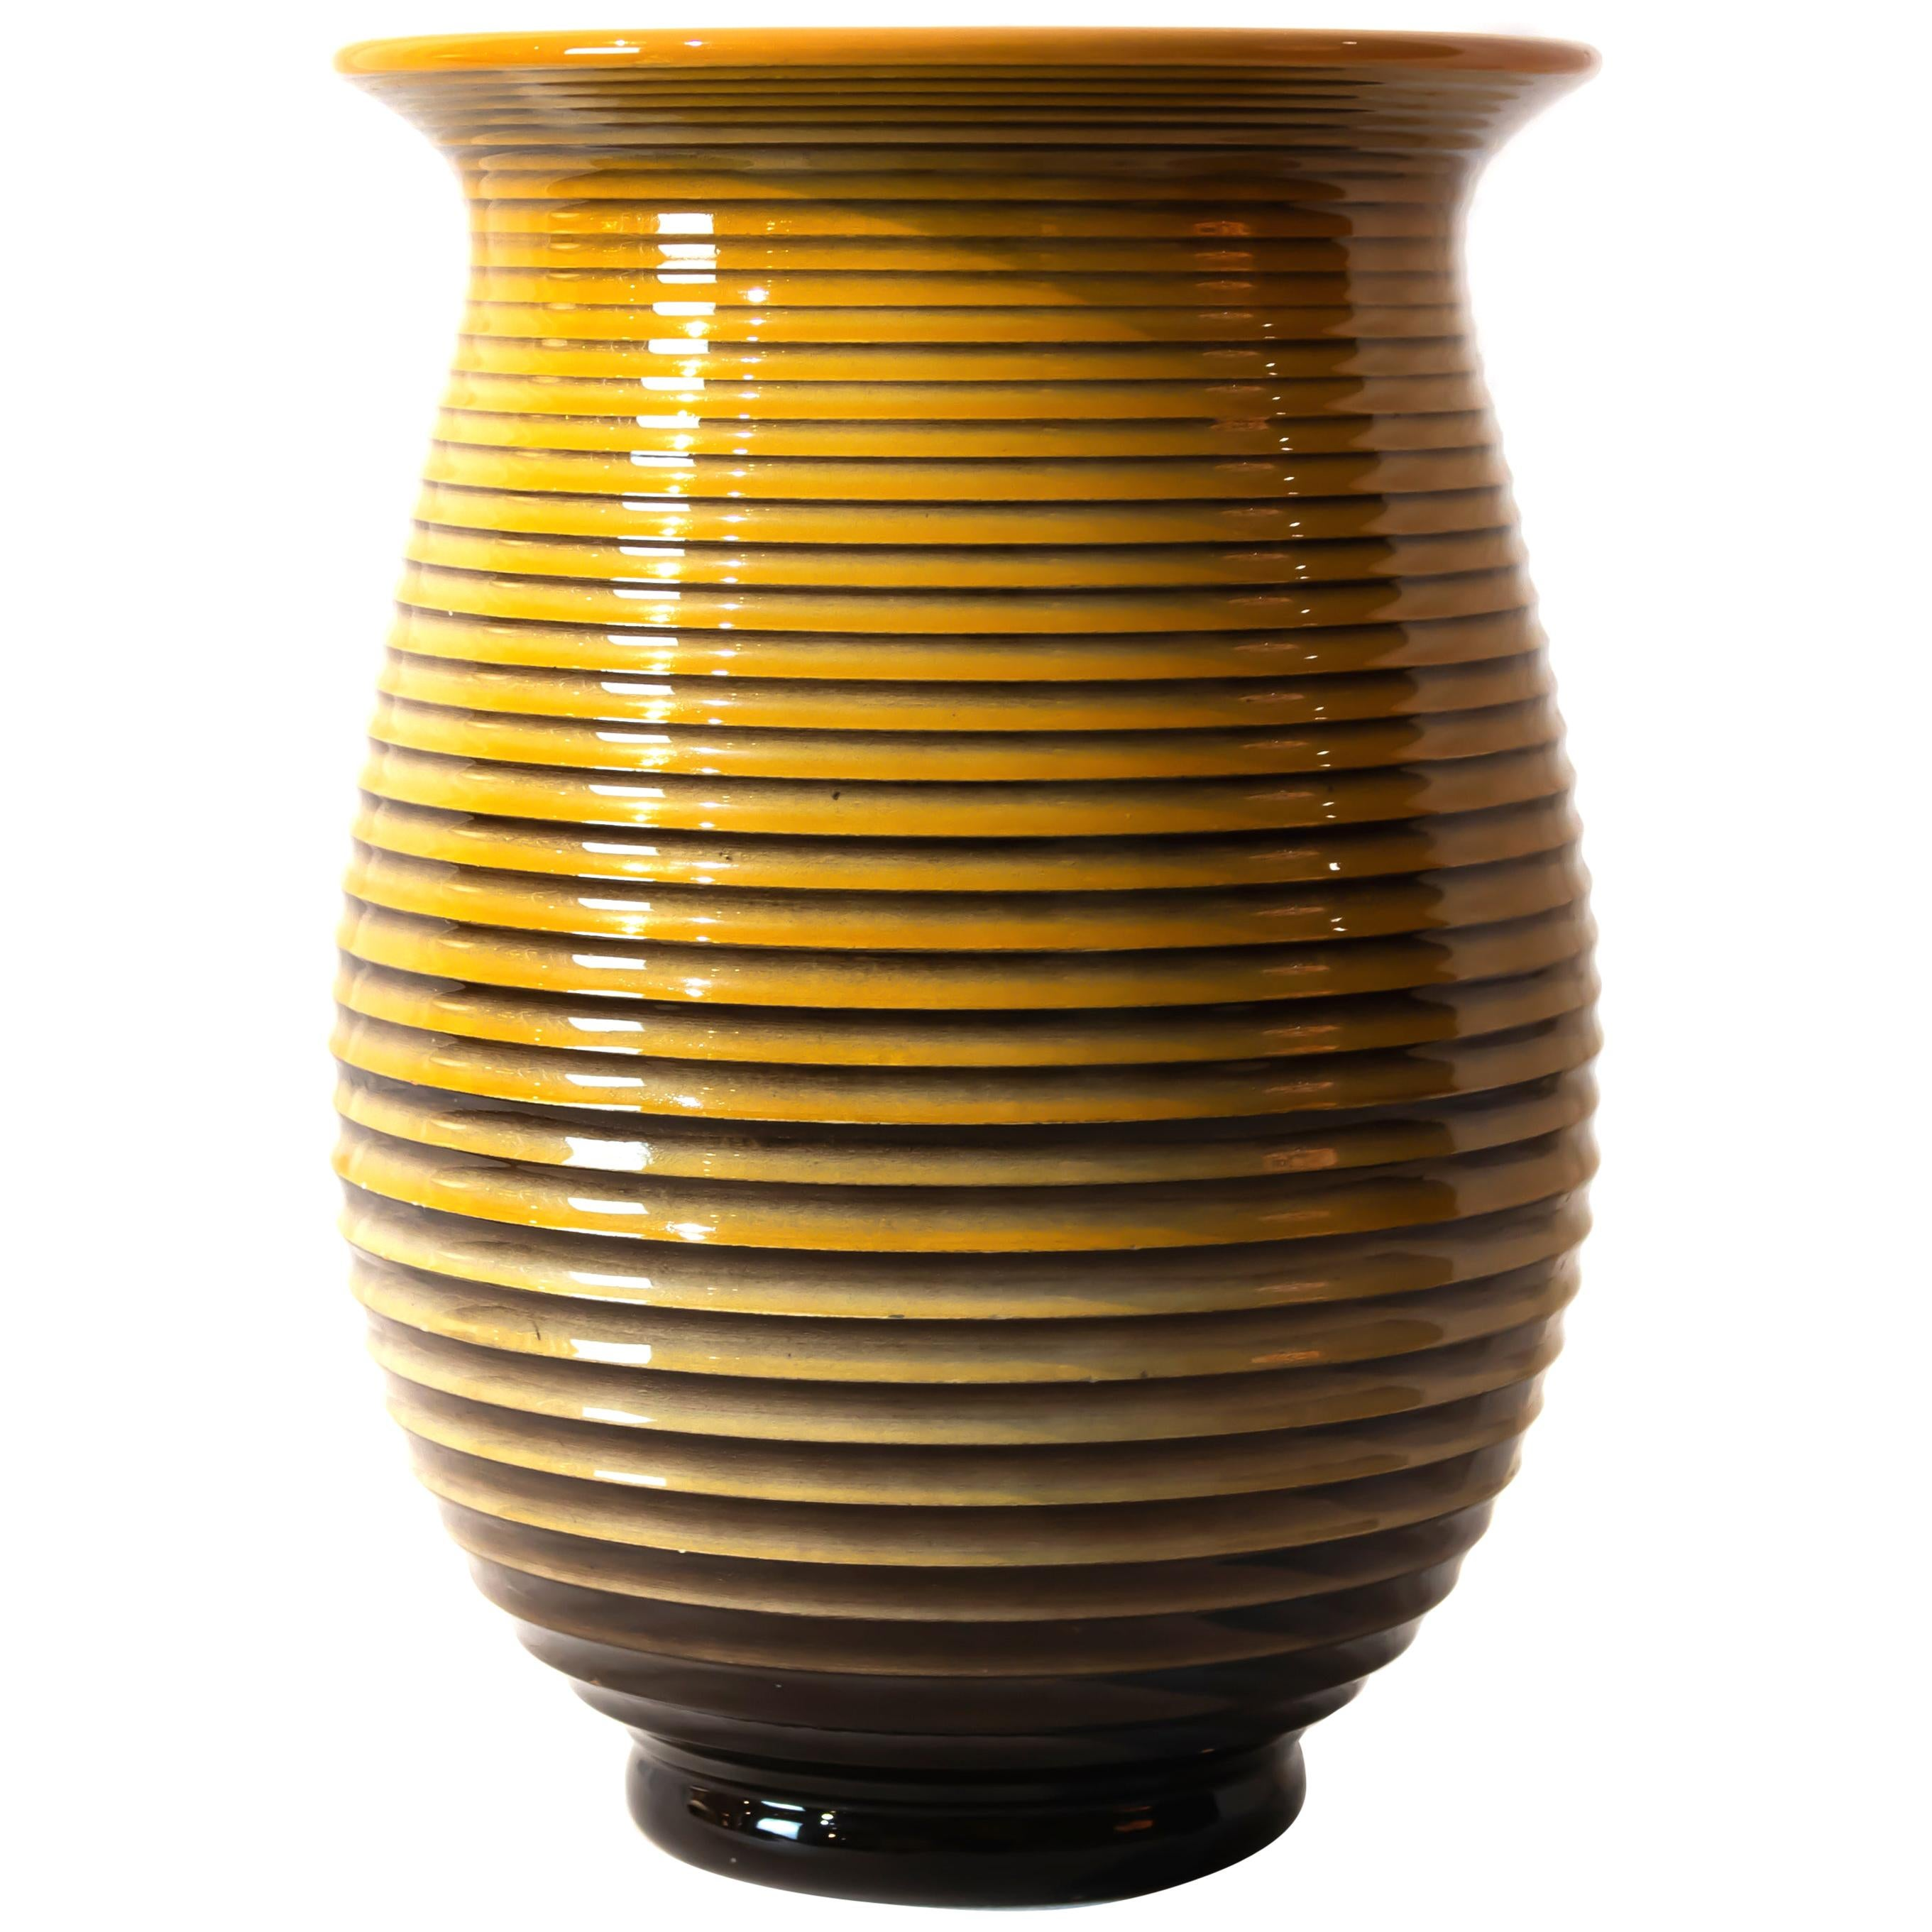 Vintage Galvani Ceramic Vase, Italy, 1970s